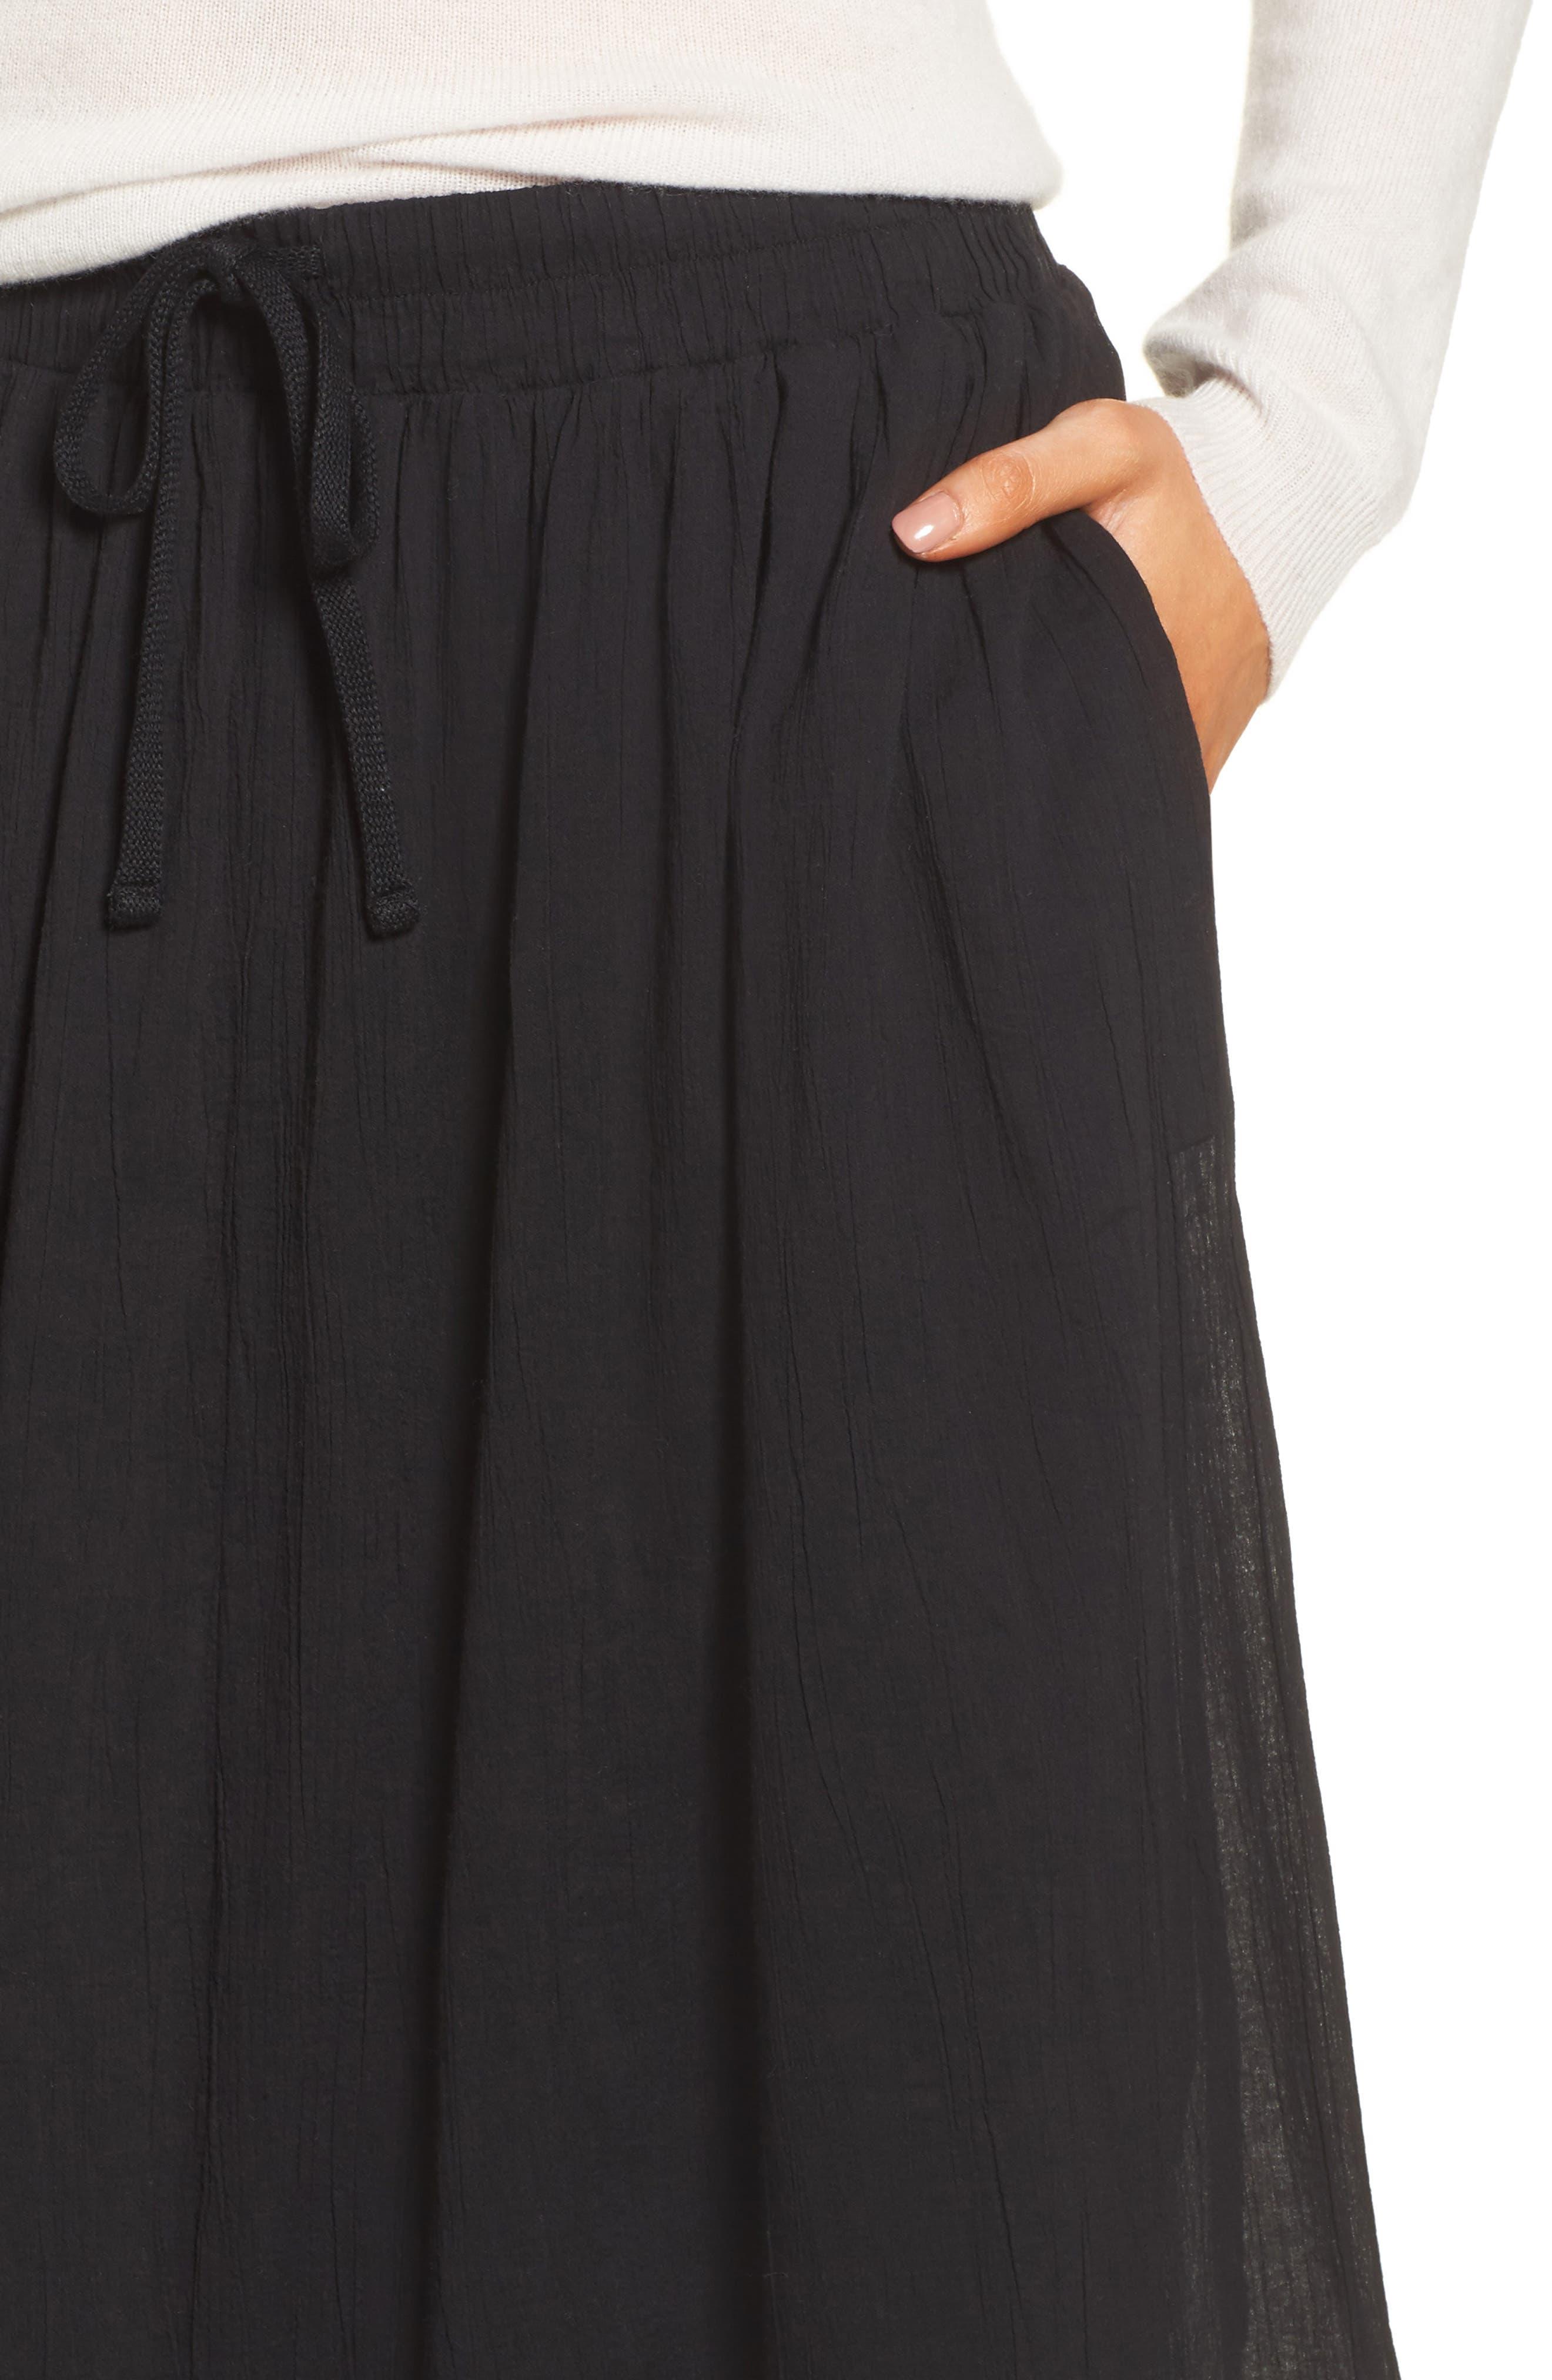 Gauze Midi Skirt,                             Alternate thumbnail 4, color,                             001